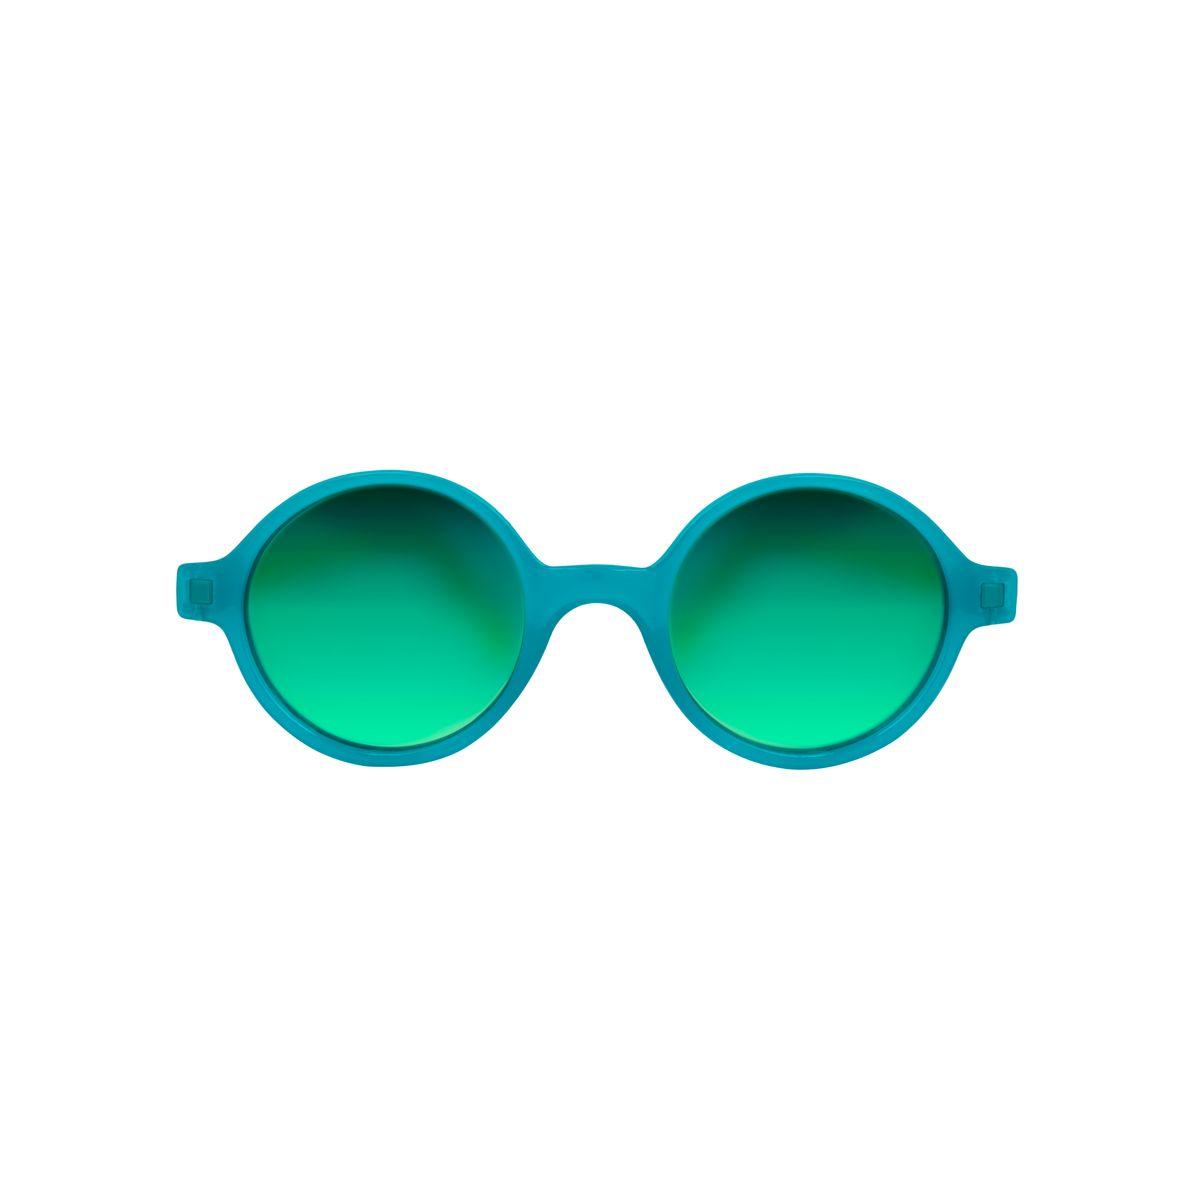 KiETLA CraZyg-Zag slnečné okuliare RoZZ 4-6 rokov